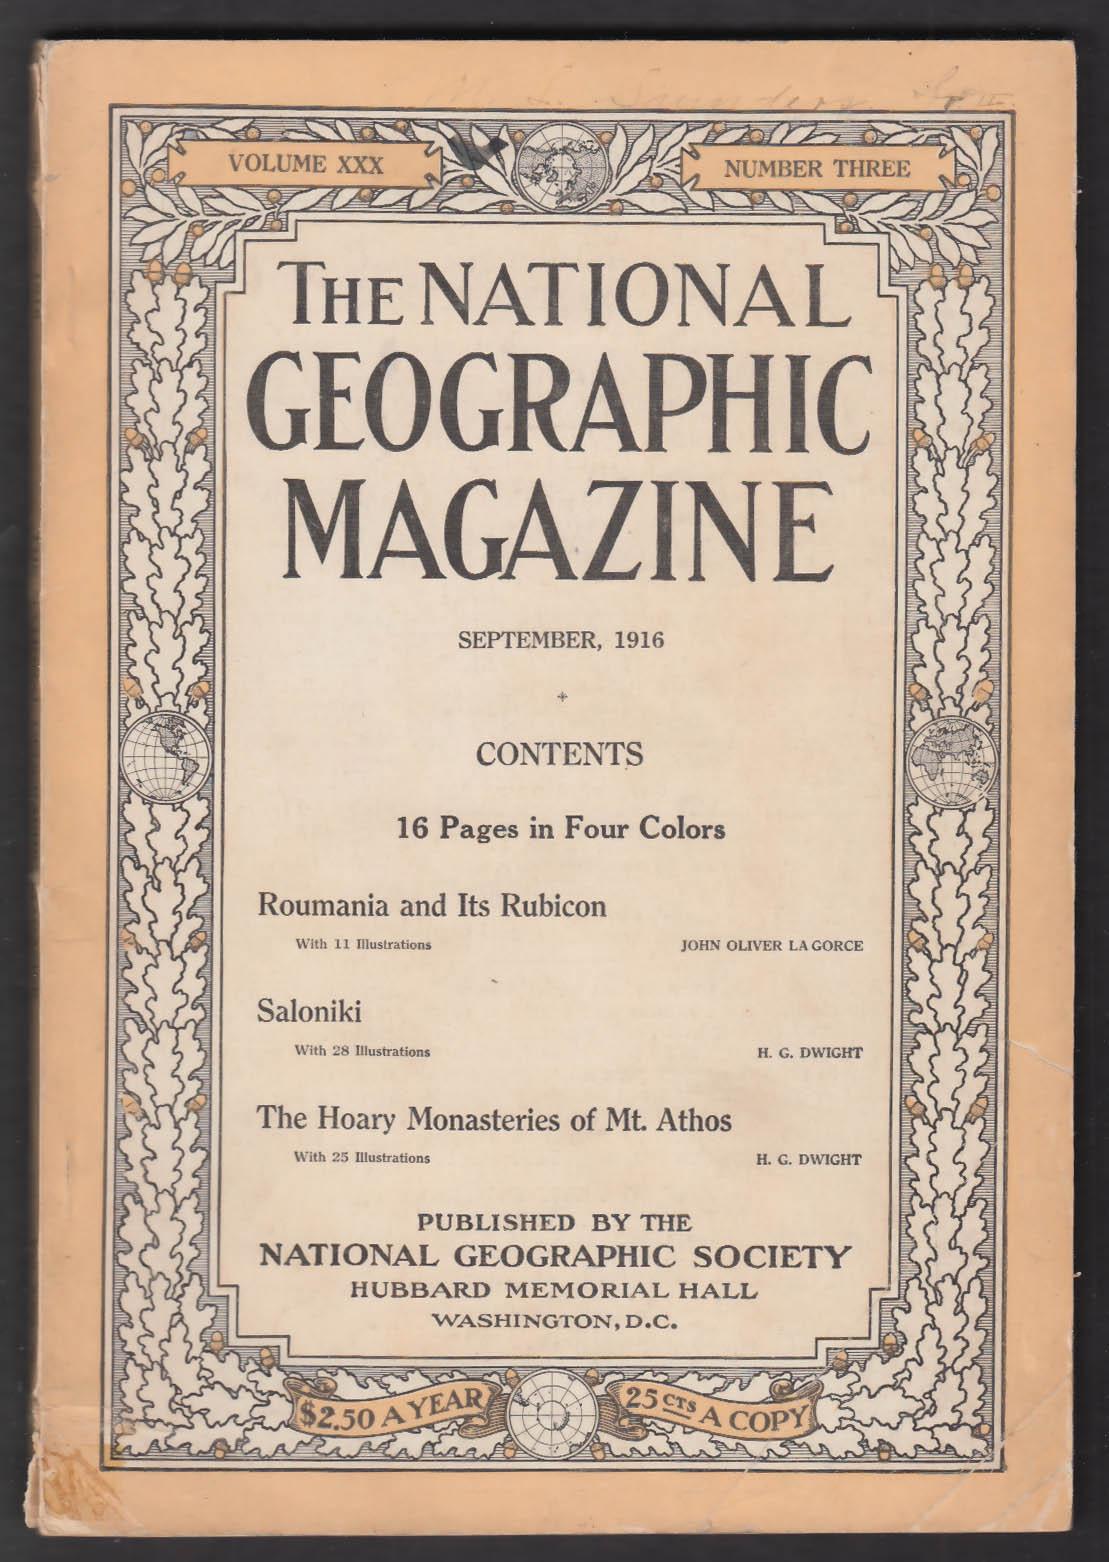 NATIONAL GEOGRAPHIC Romania Rumania Rubicon Saloniki Mt Athos + 9 1916